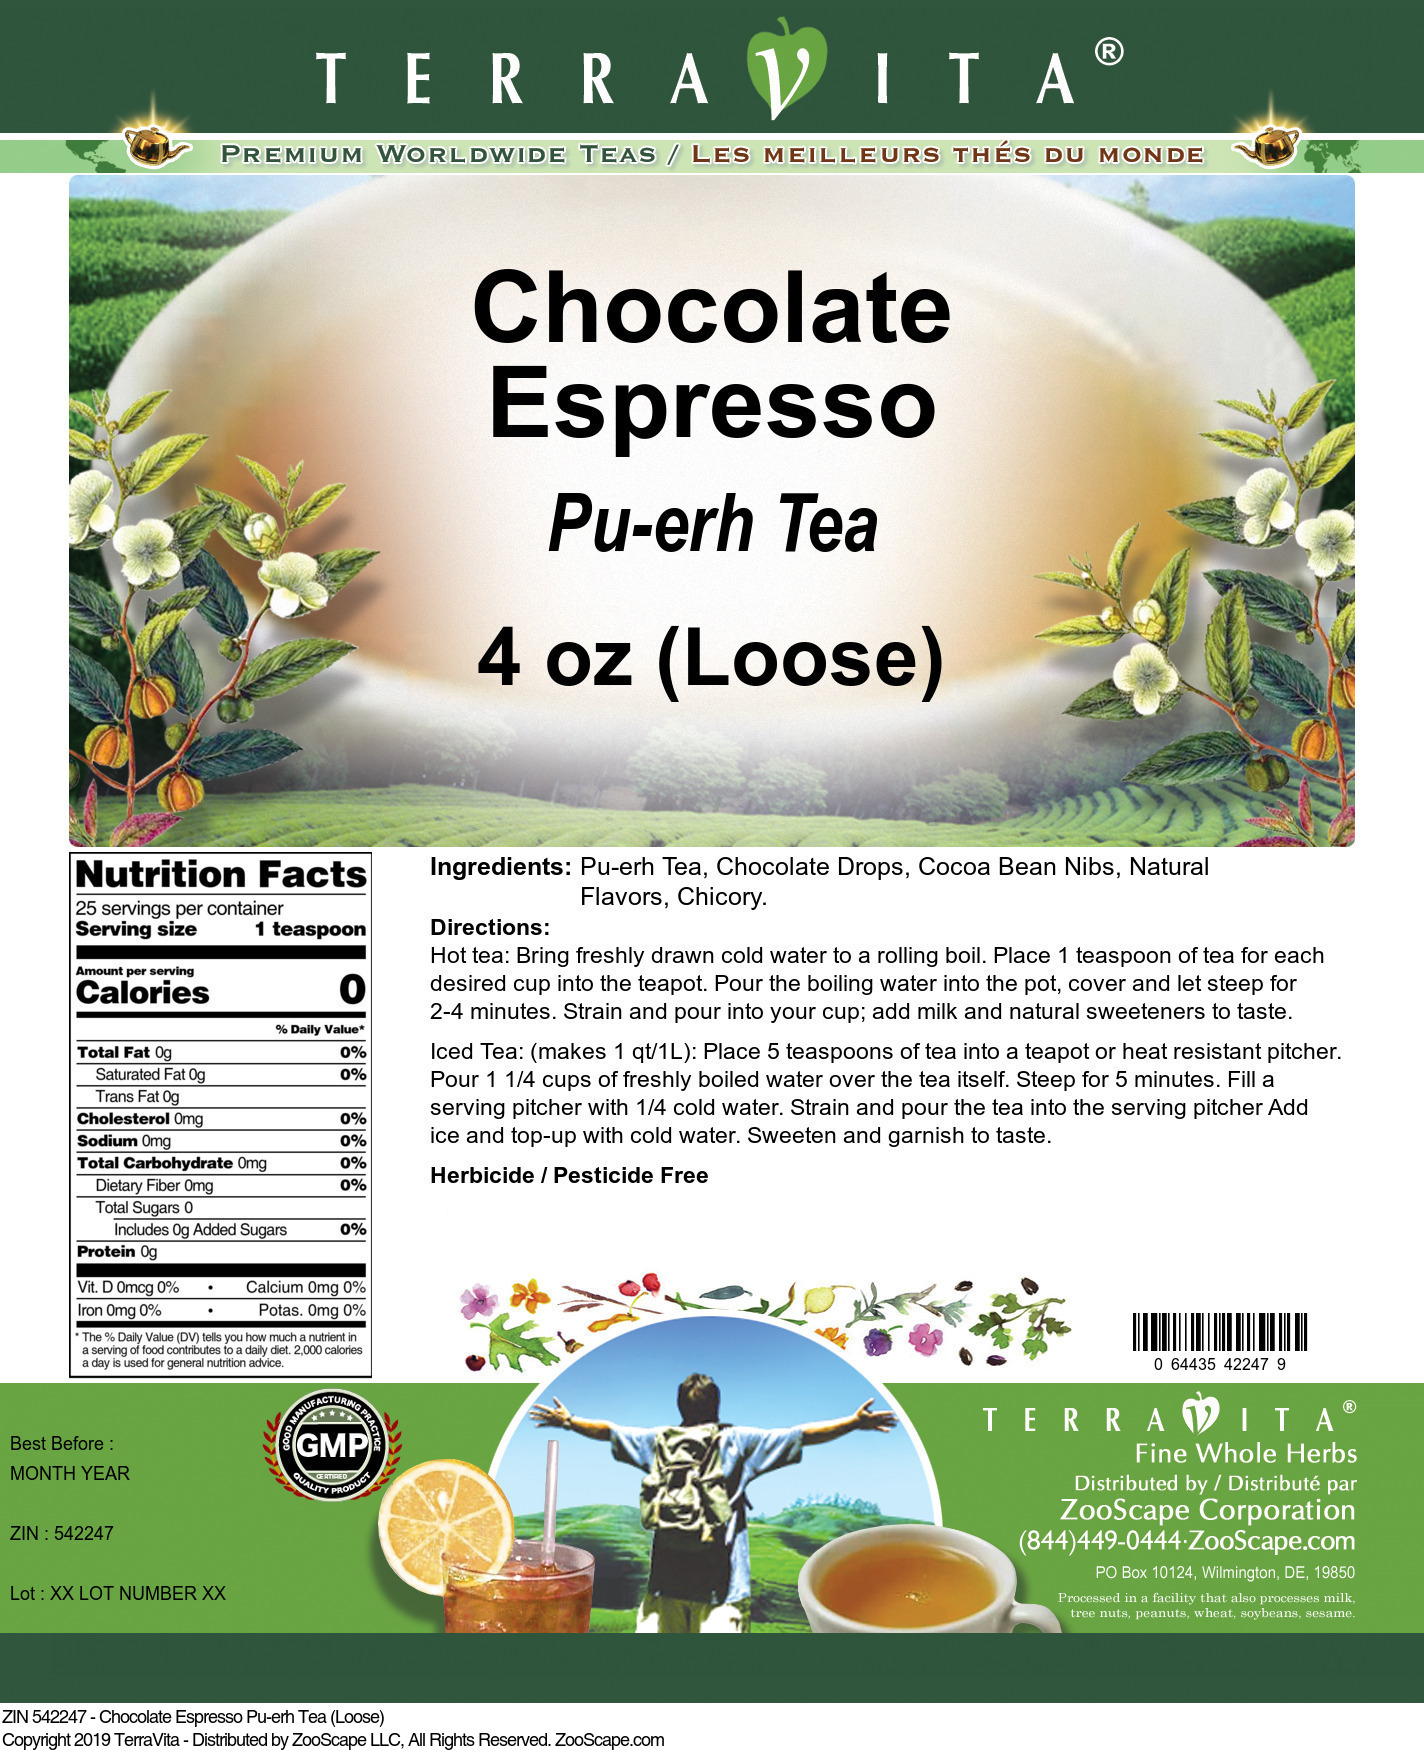 Chocolate Espresso Pu-erh Tea